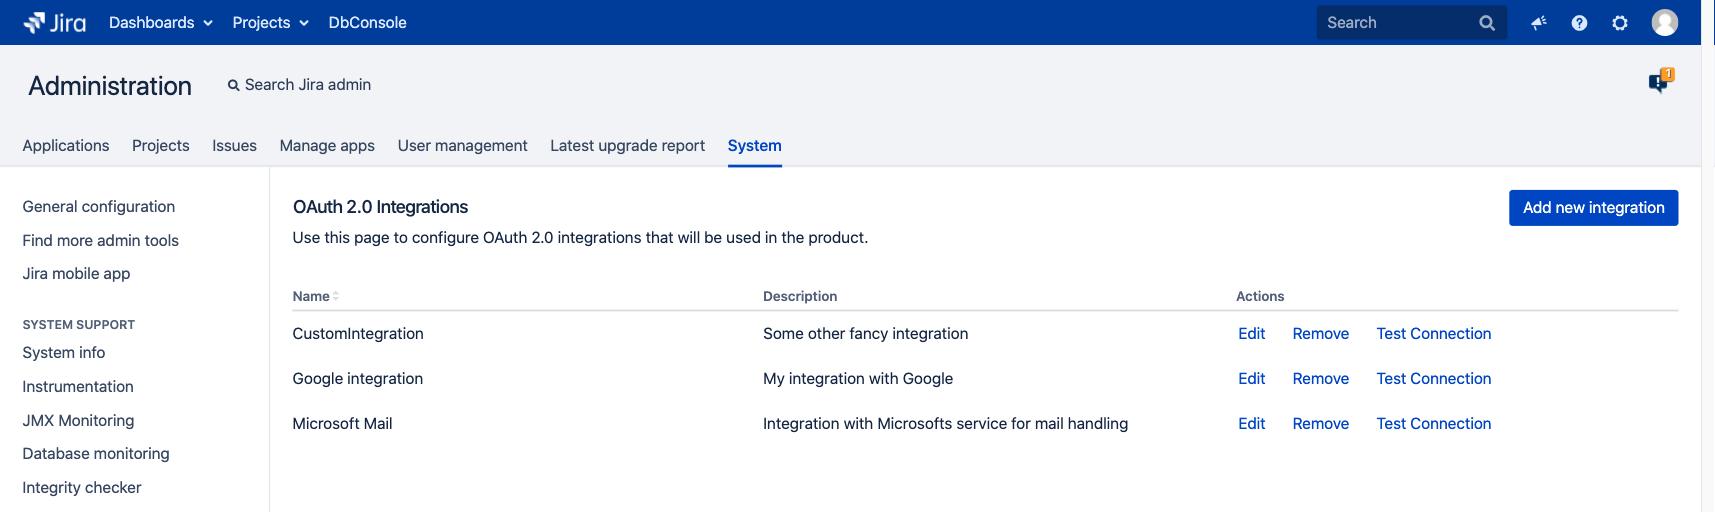 Jira 管理コンソールの OAuth 2.0 の連携に関するページ。